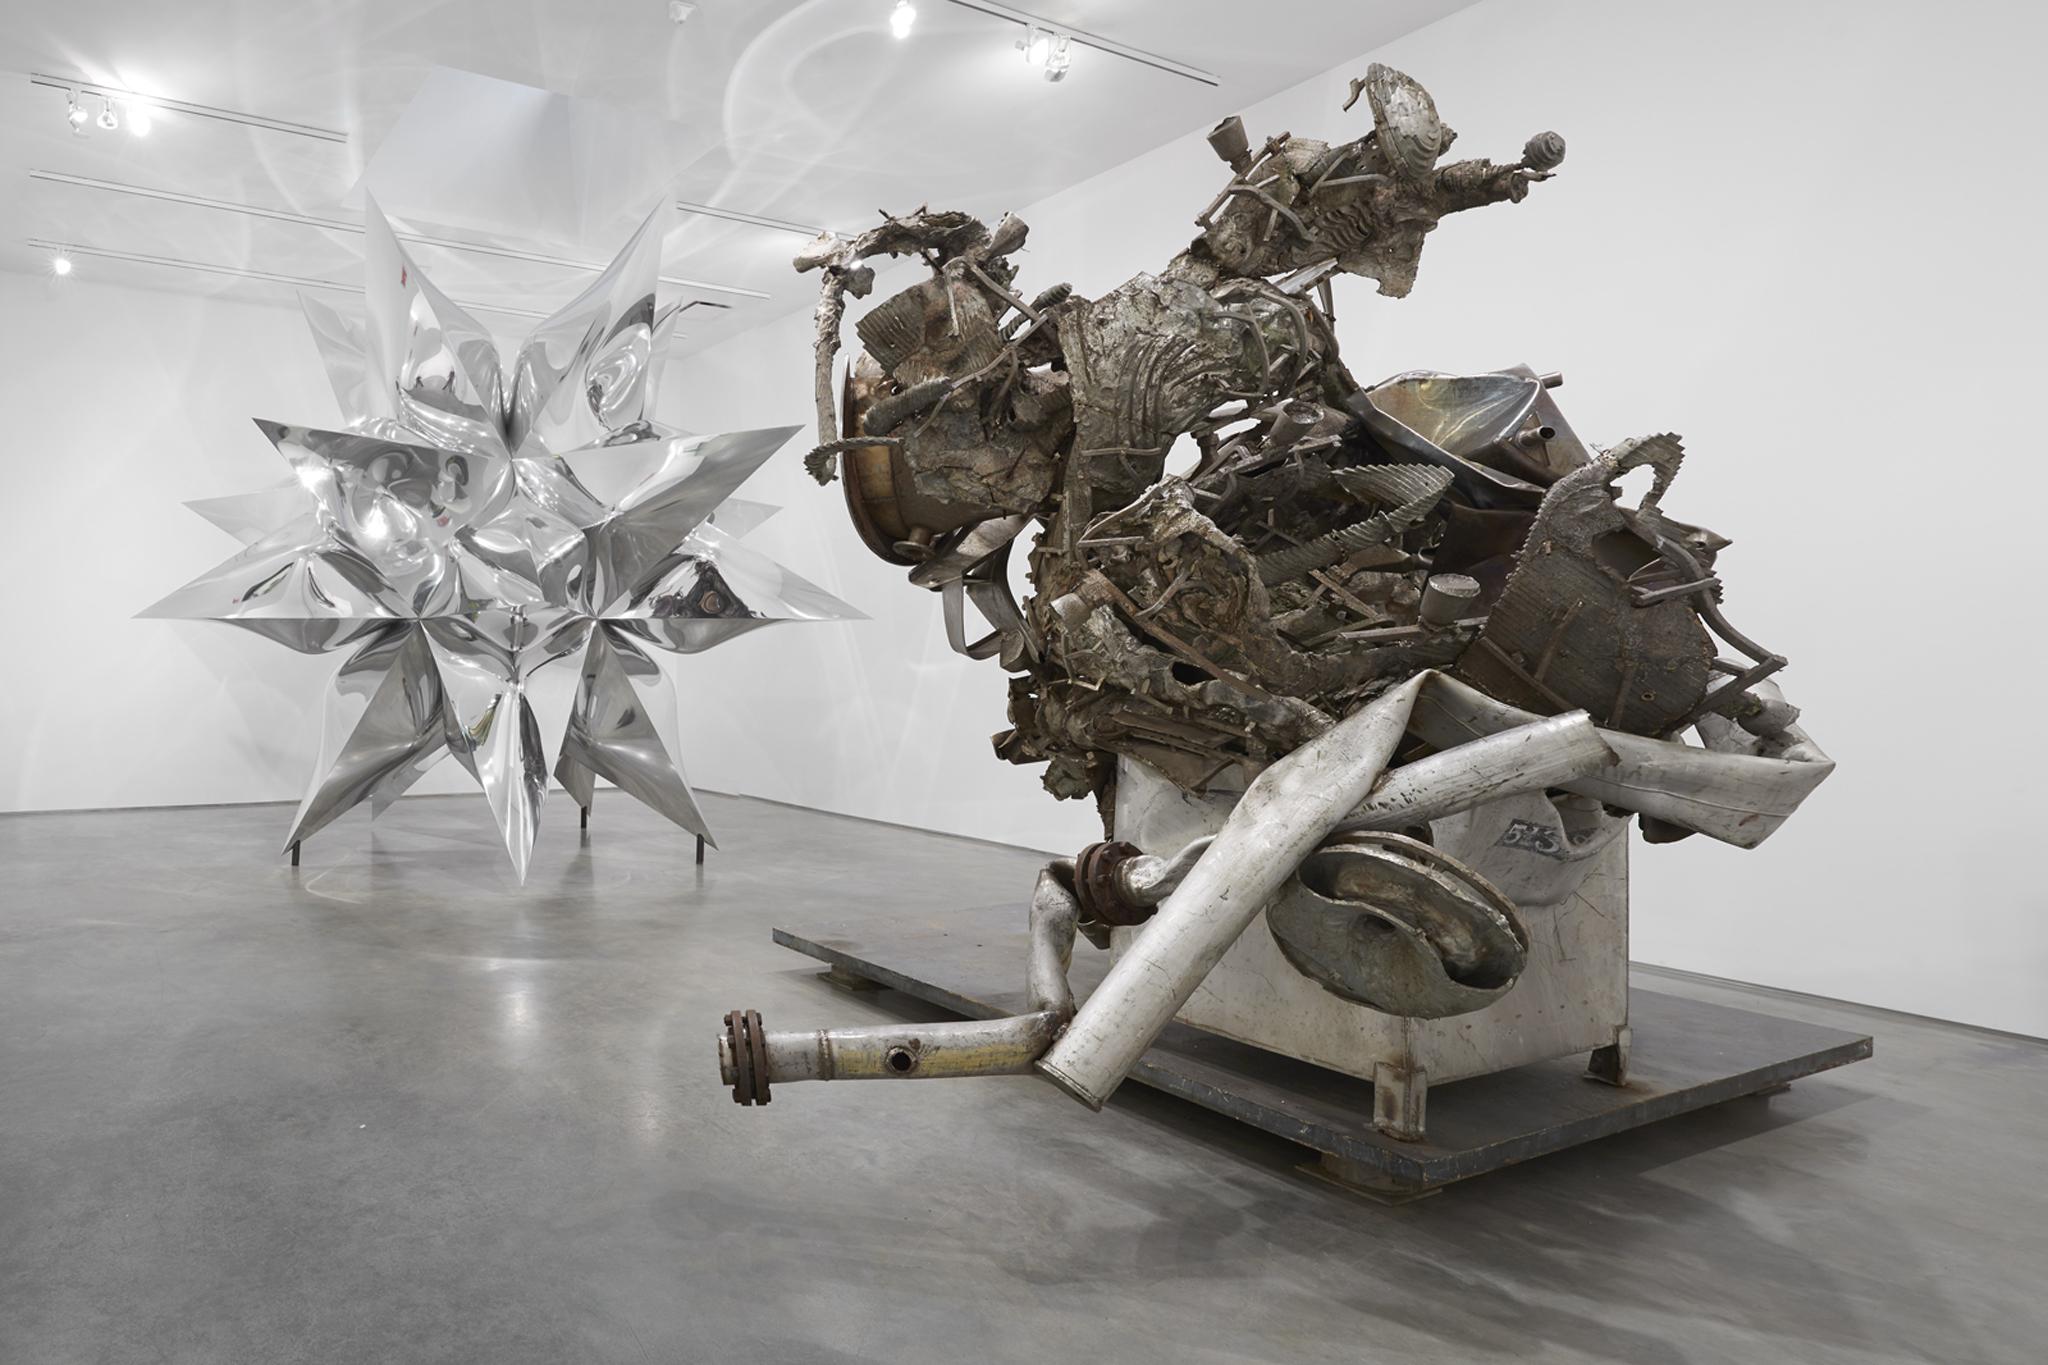 Frank Stella Quot Sculpture Quot Art In New York